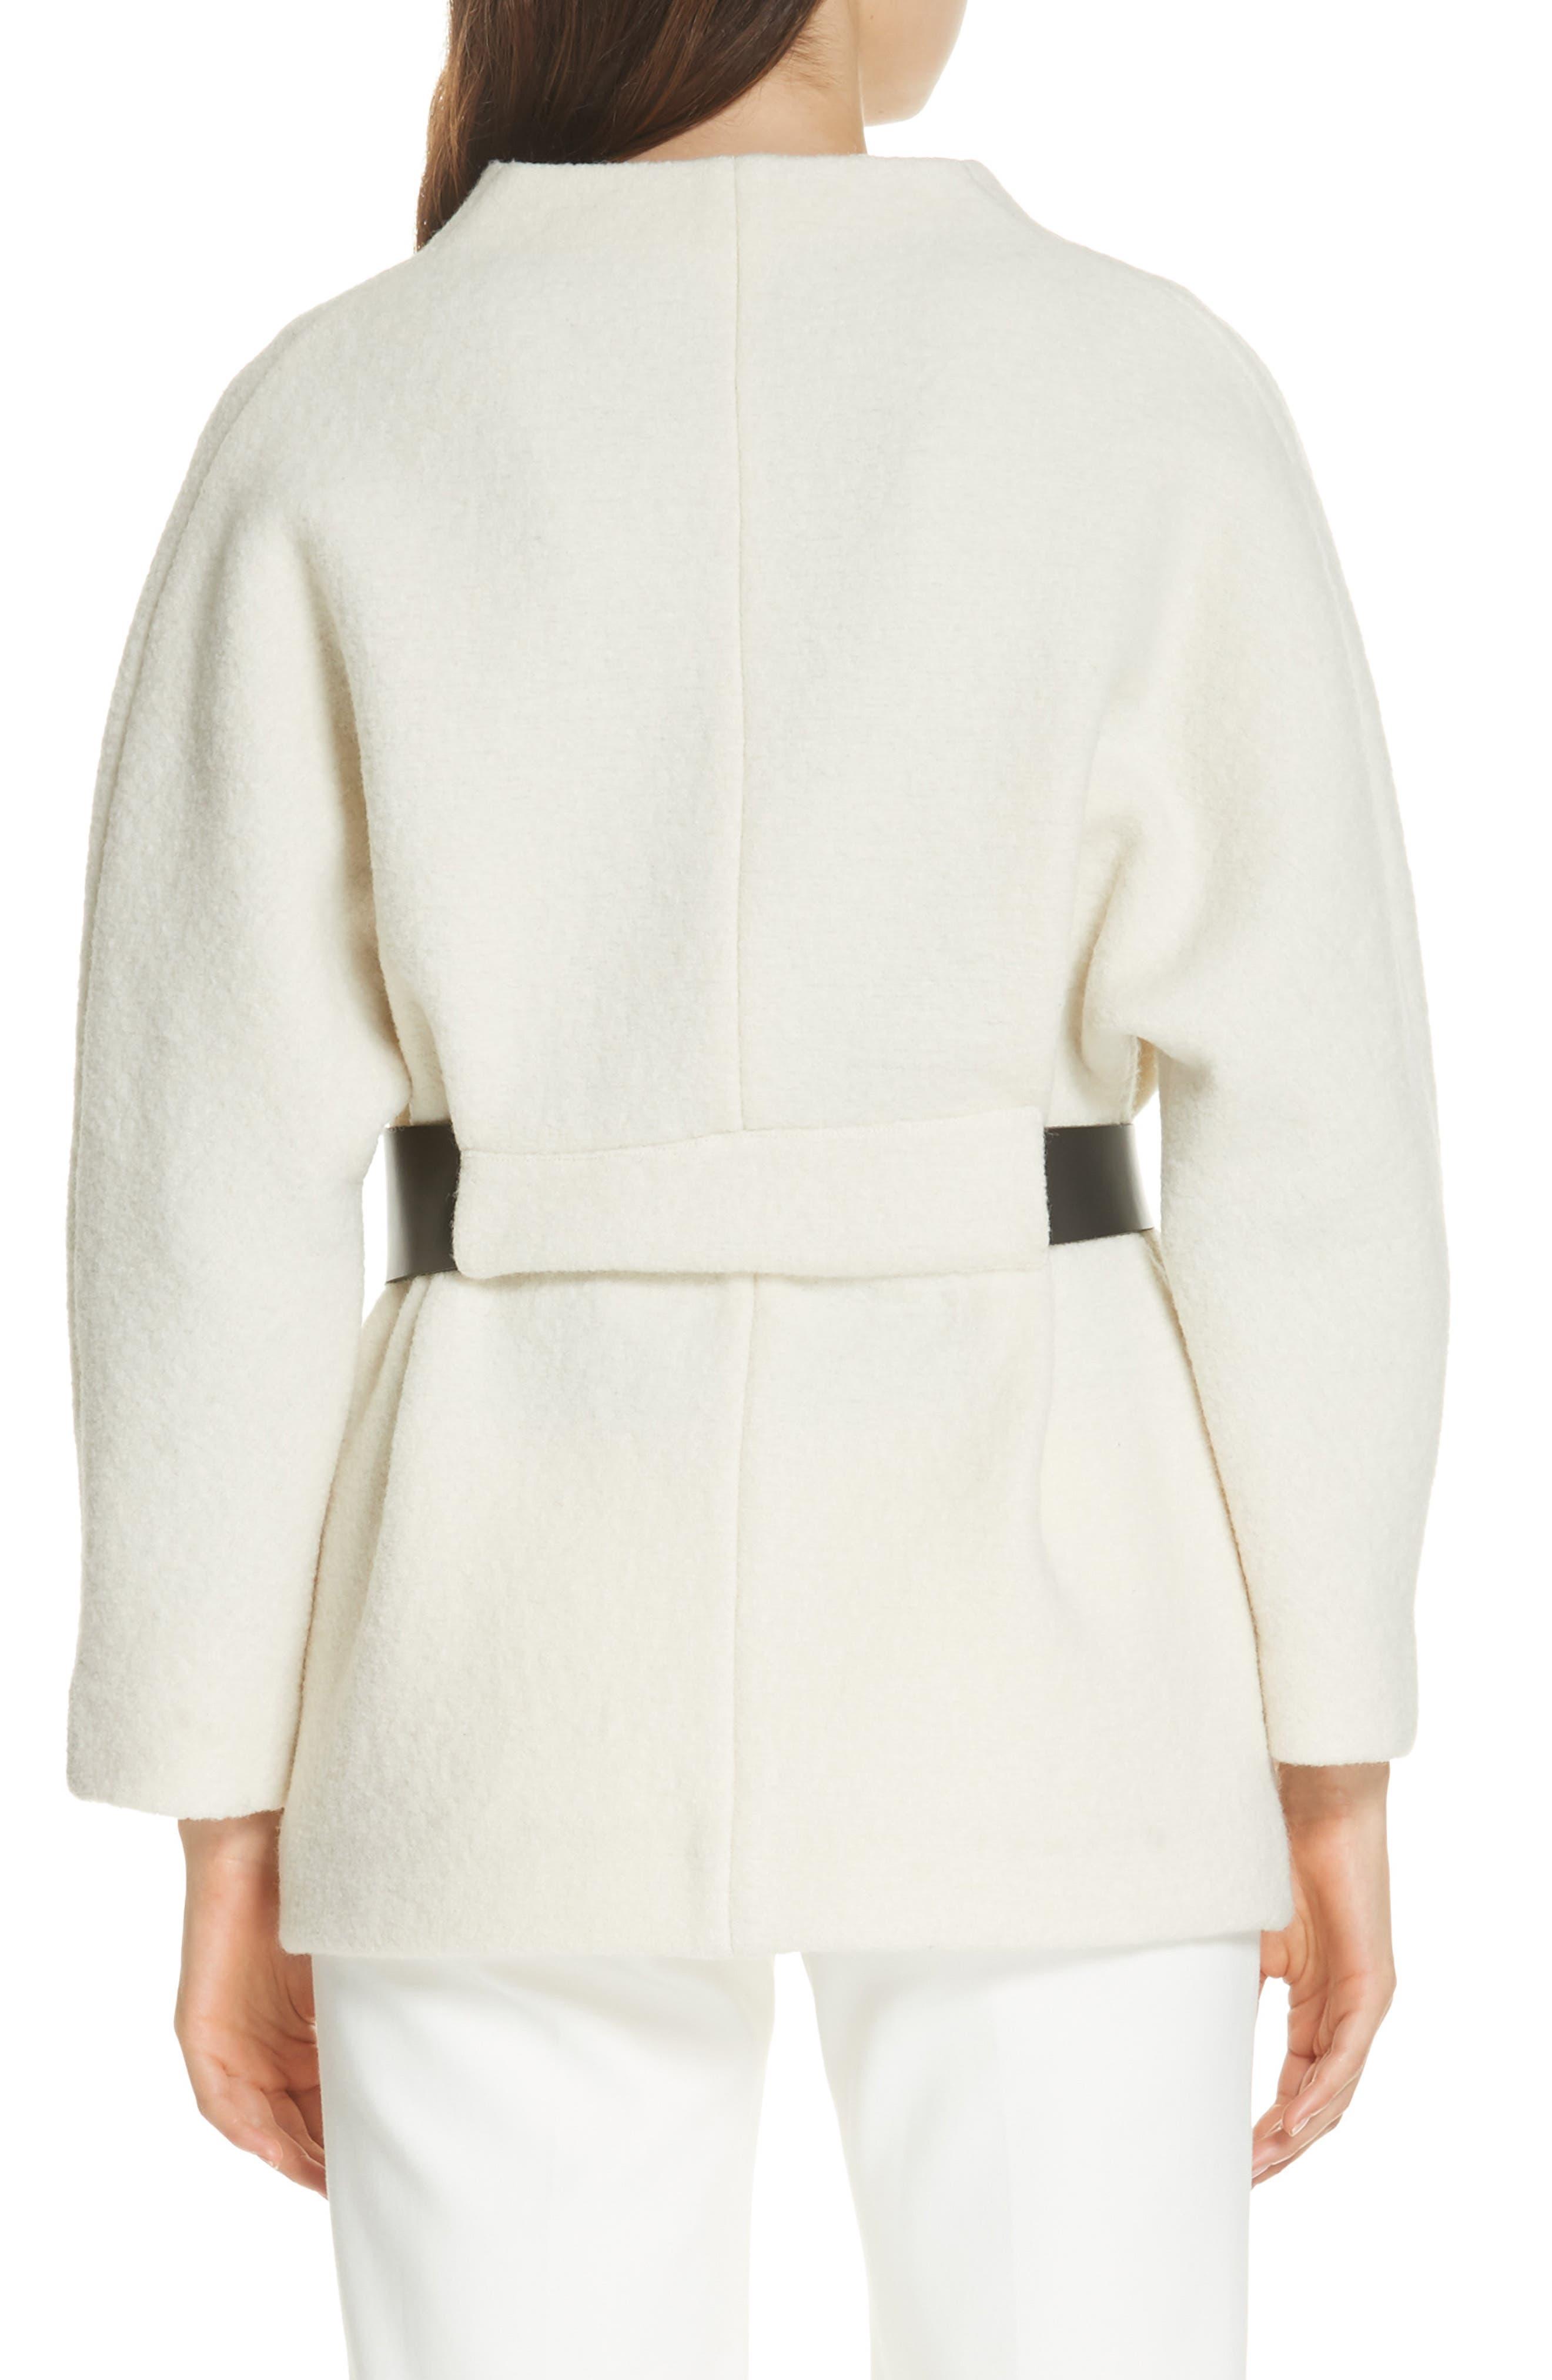 Clif Belted Wool Coat,                             Alternate thumbnail 2, color,                             ECRU